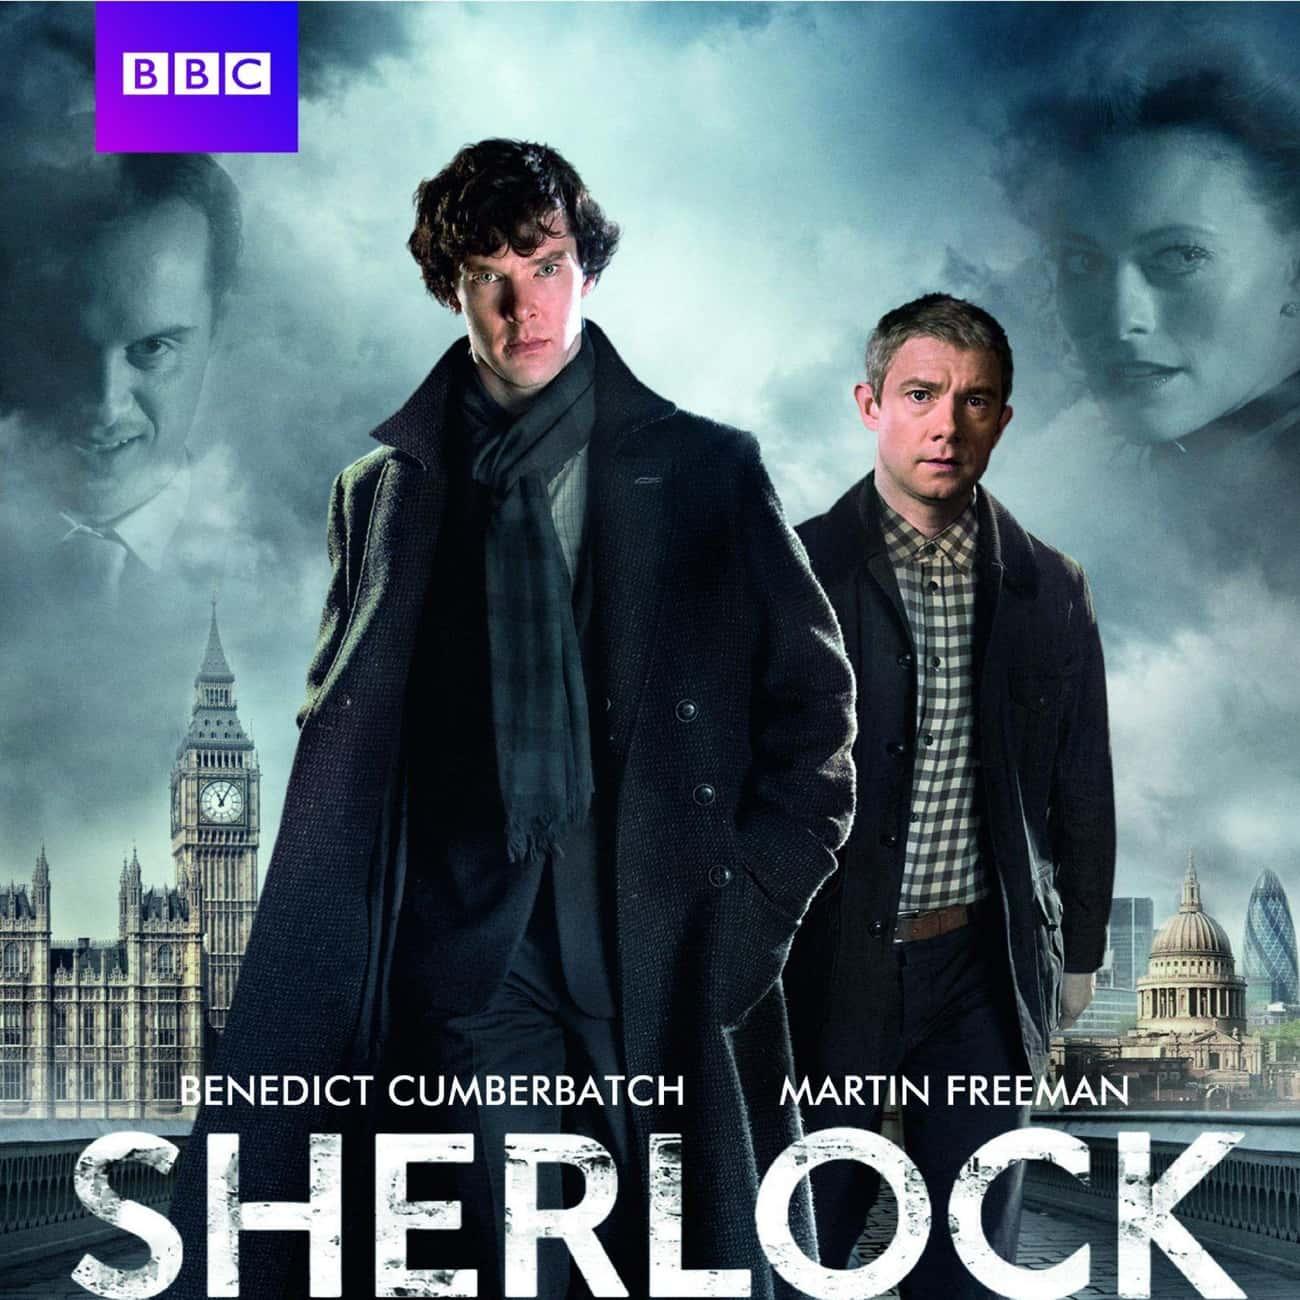 Sherlock - Season 2 is listed (or ranked) 1 on the list Ranking the Best Seasons of 'Sherlock'